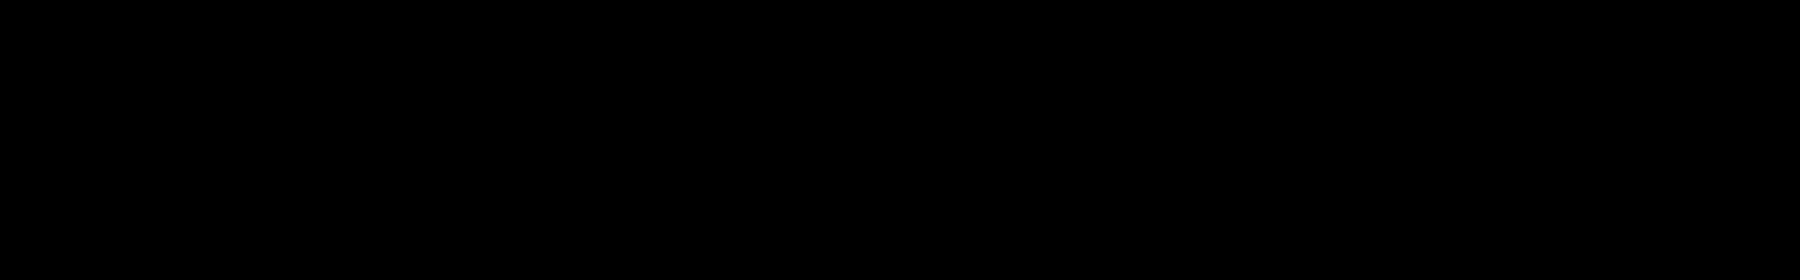 Compass audio waveform